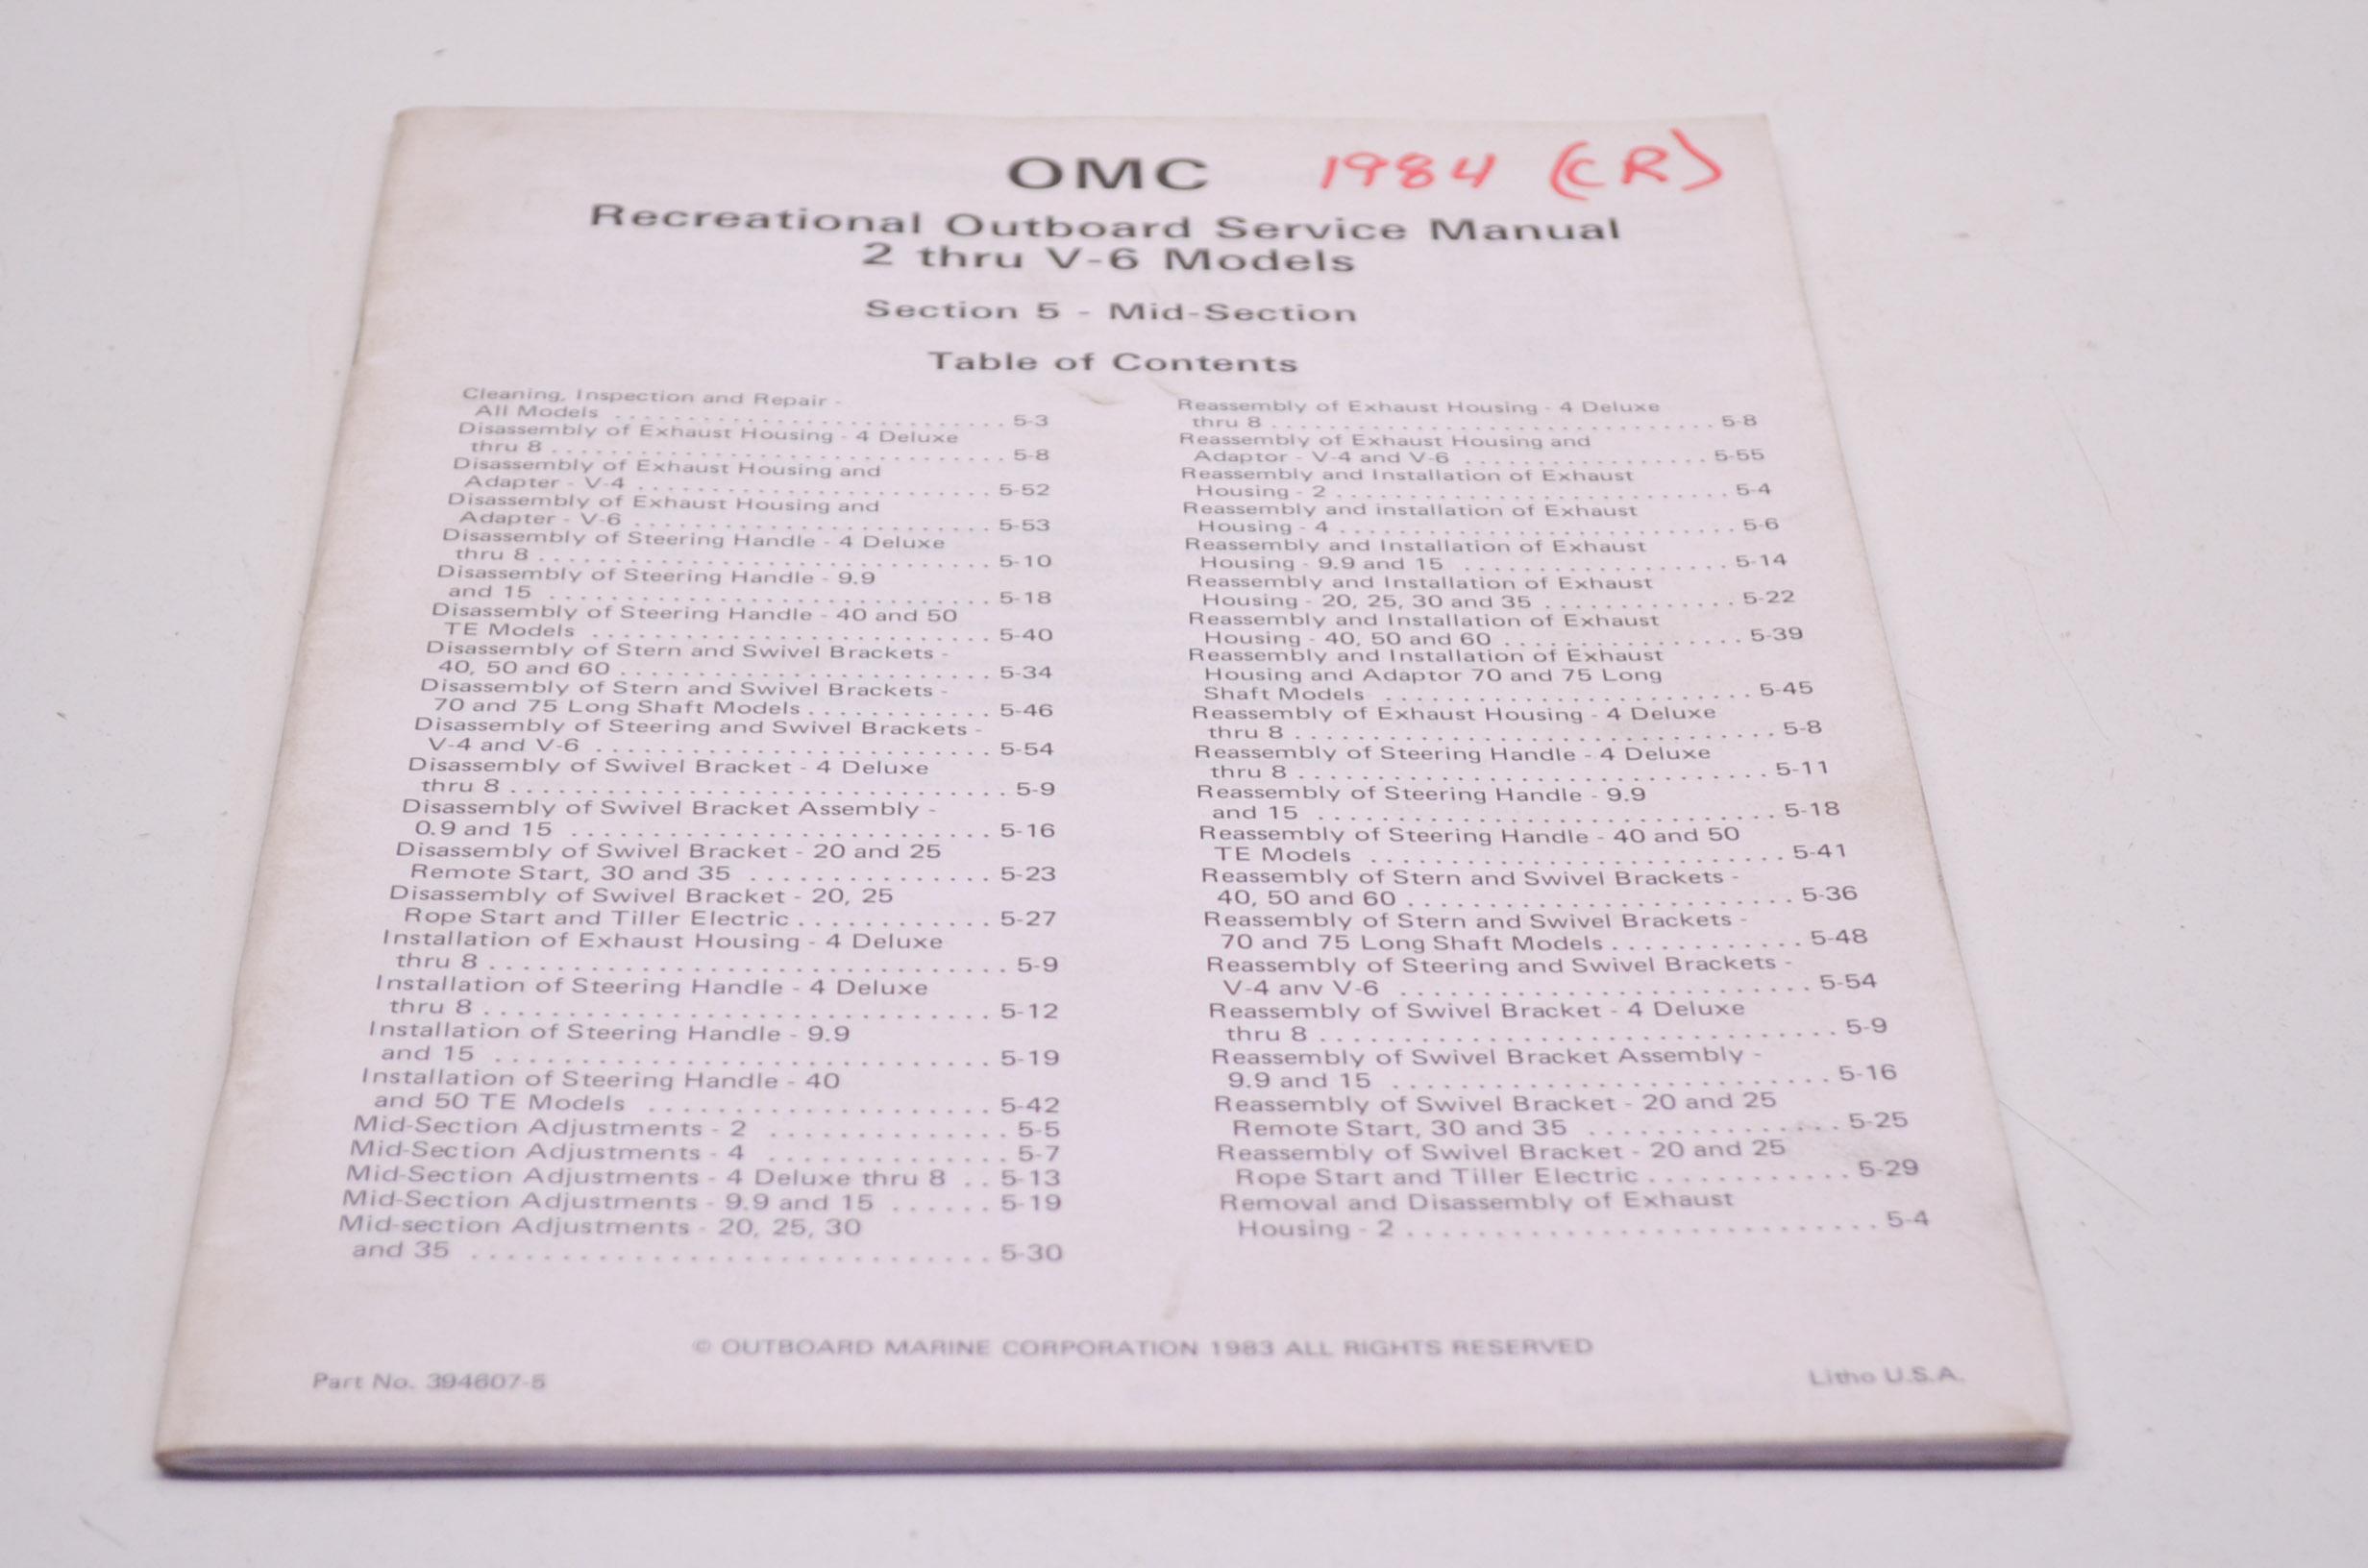 Omc Johnson Amp Evinrude 5 2 Through V 6 Models